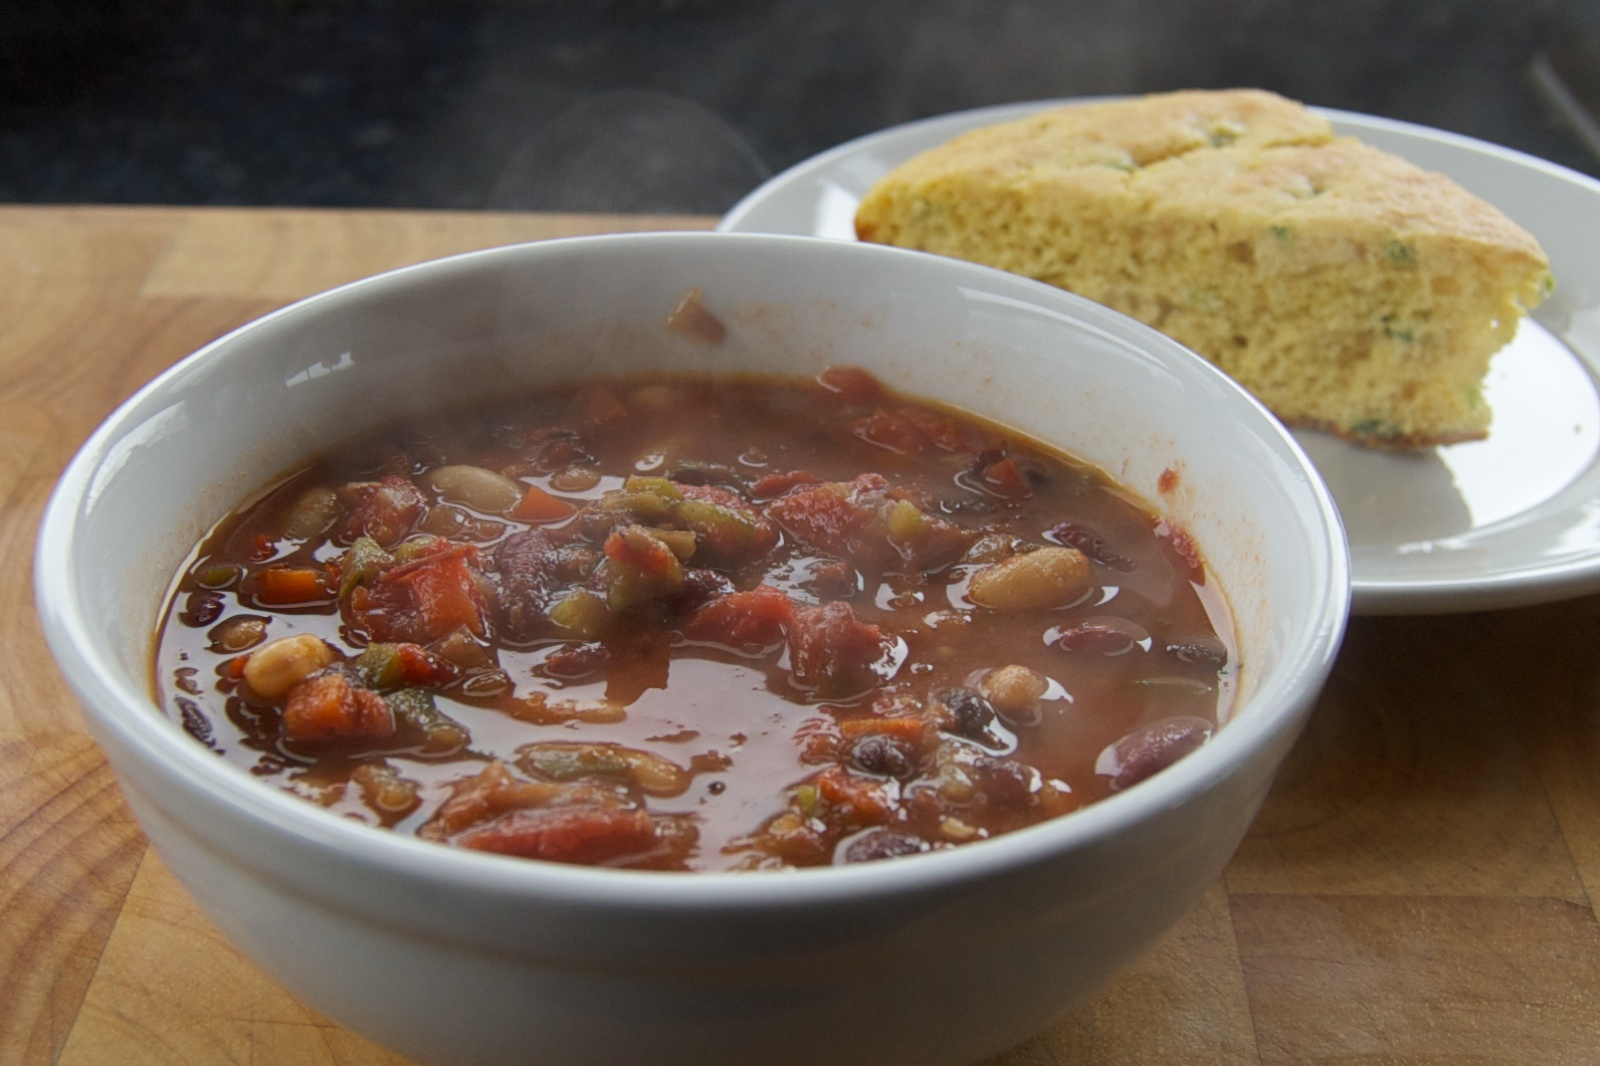 http://blog.rickk.com/food/2012/01/21/ate.2012.01.21.l.jpg